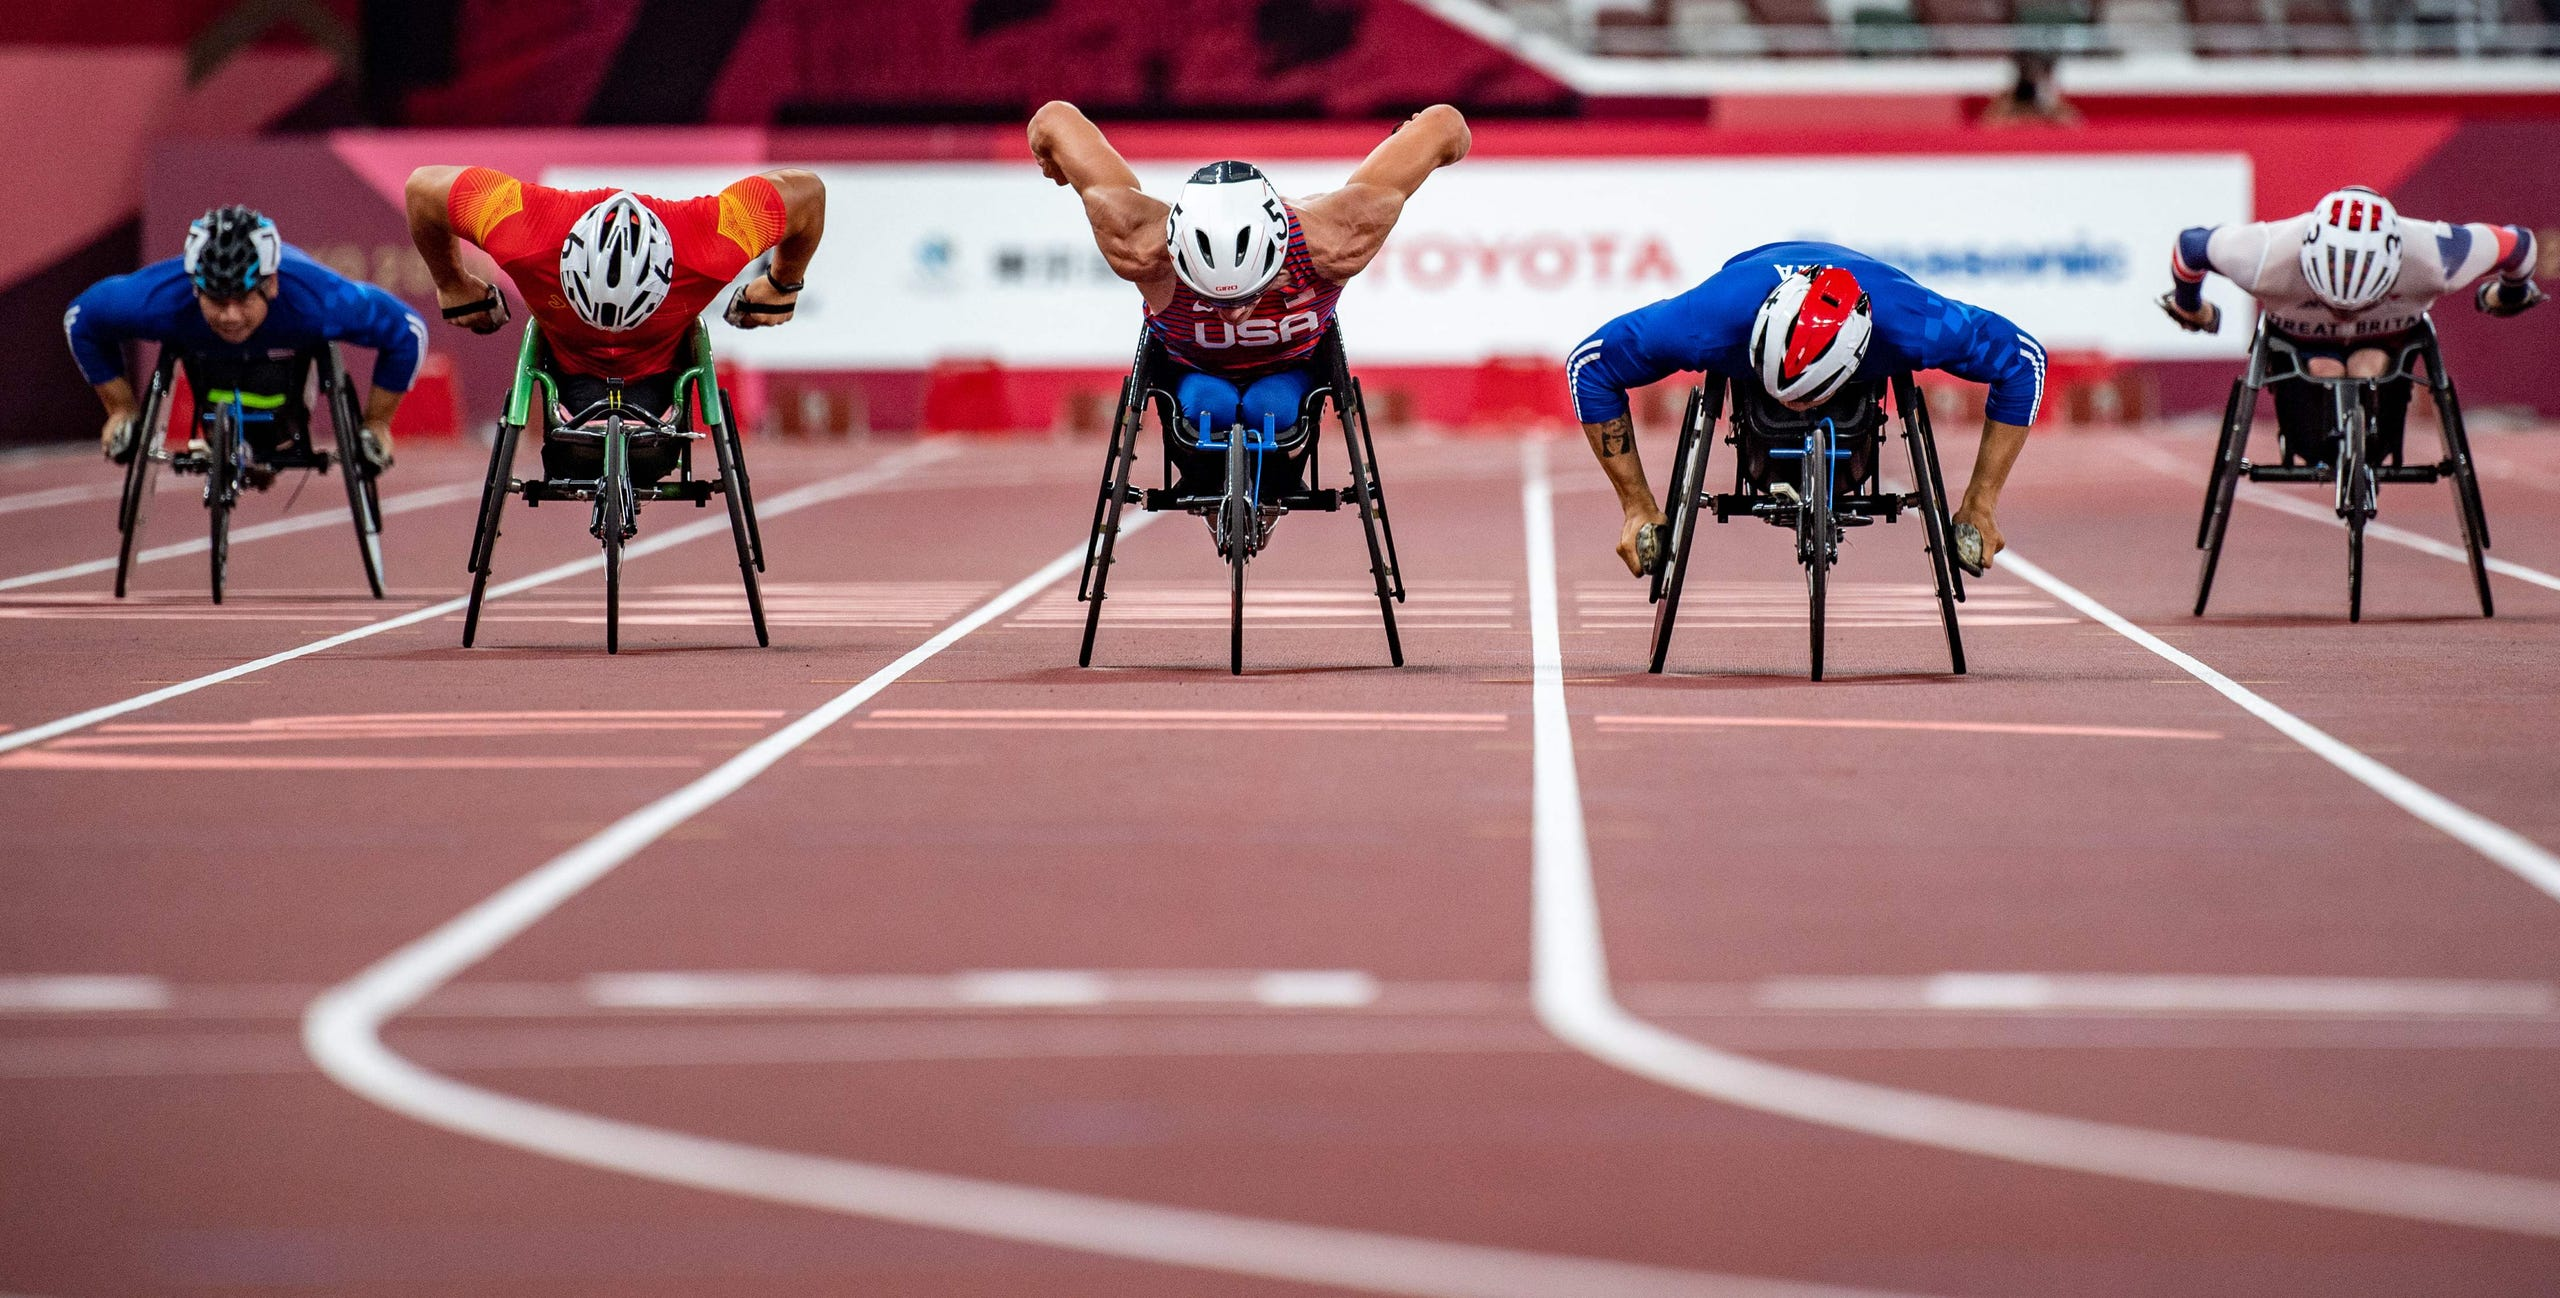 Aug. 29, 2021: USA's Daniel Romanchuk (center) competes in the men's 400-meterm - T54 final.